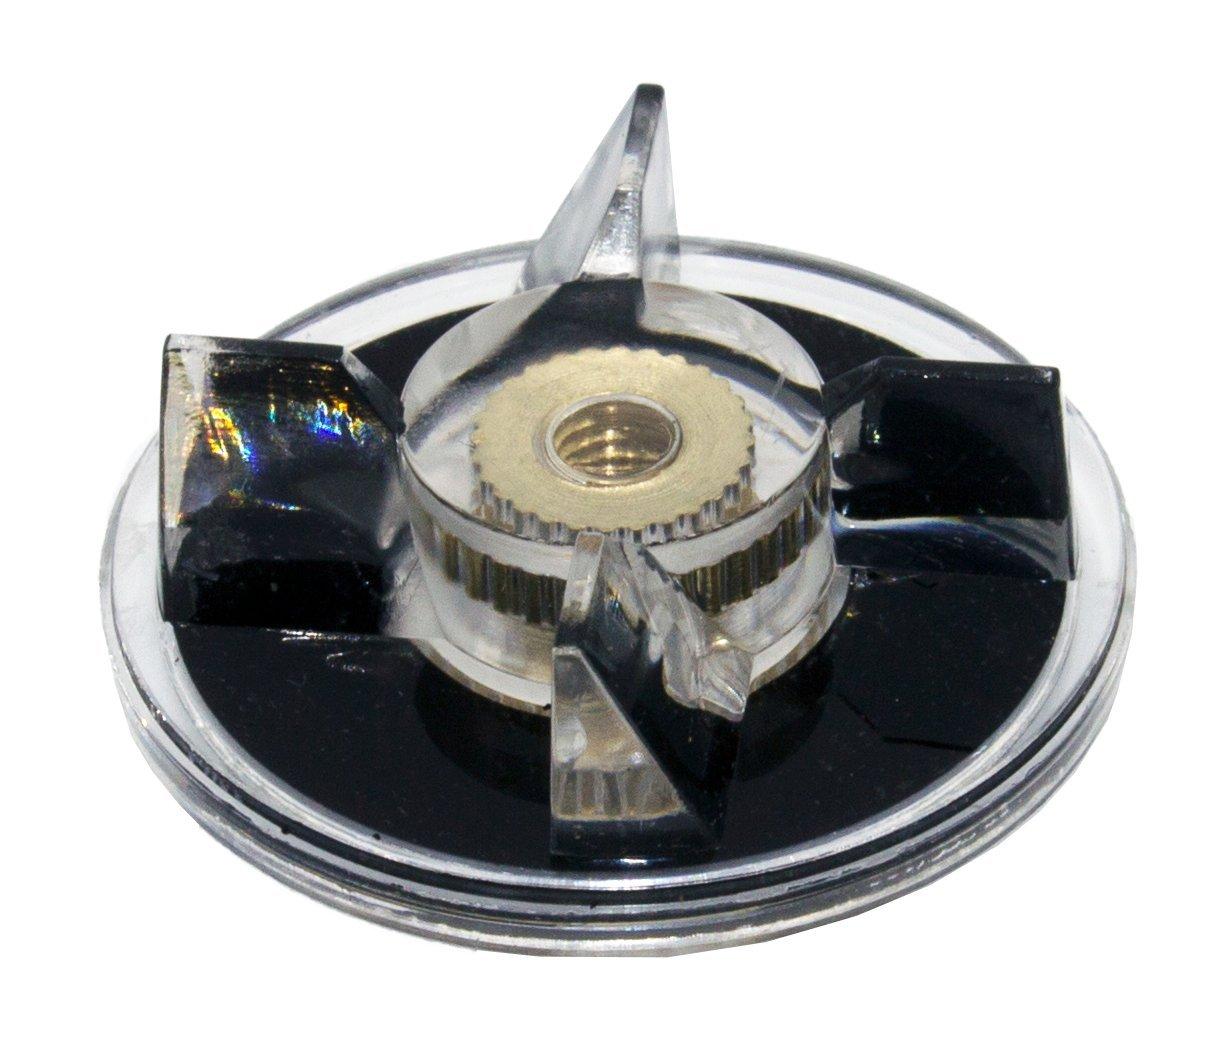 Blendin Replacement 4 Base Gears 4 Blade Gears Clutch Parts Fits Magic Bullet MB1001 Blender